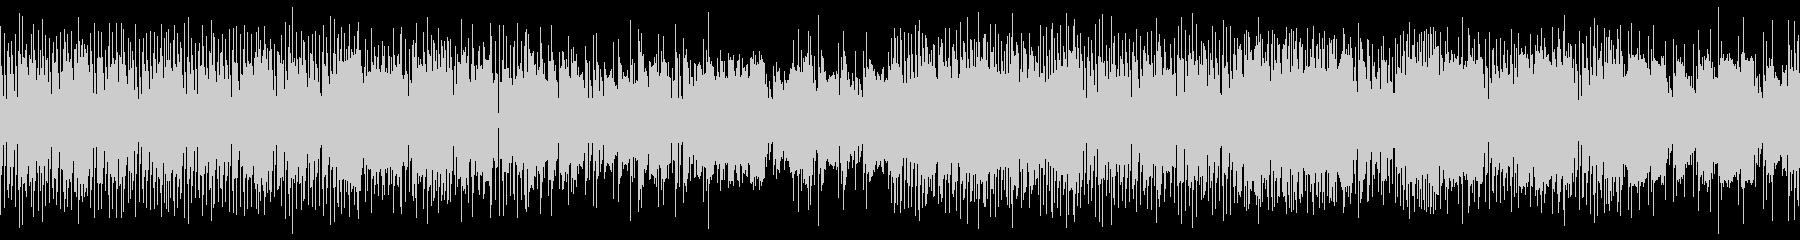 8bitとEベースと生ドラムのゲーム風曲の未再生の波形